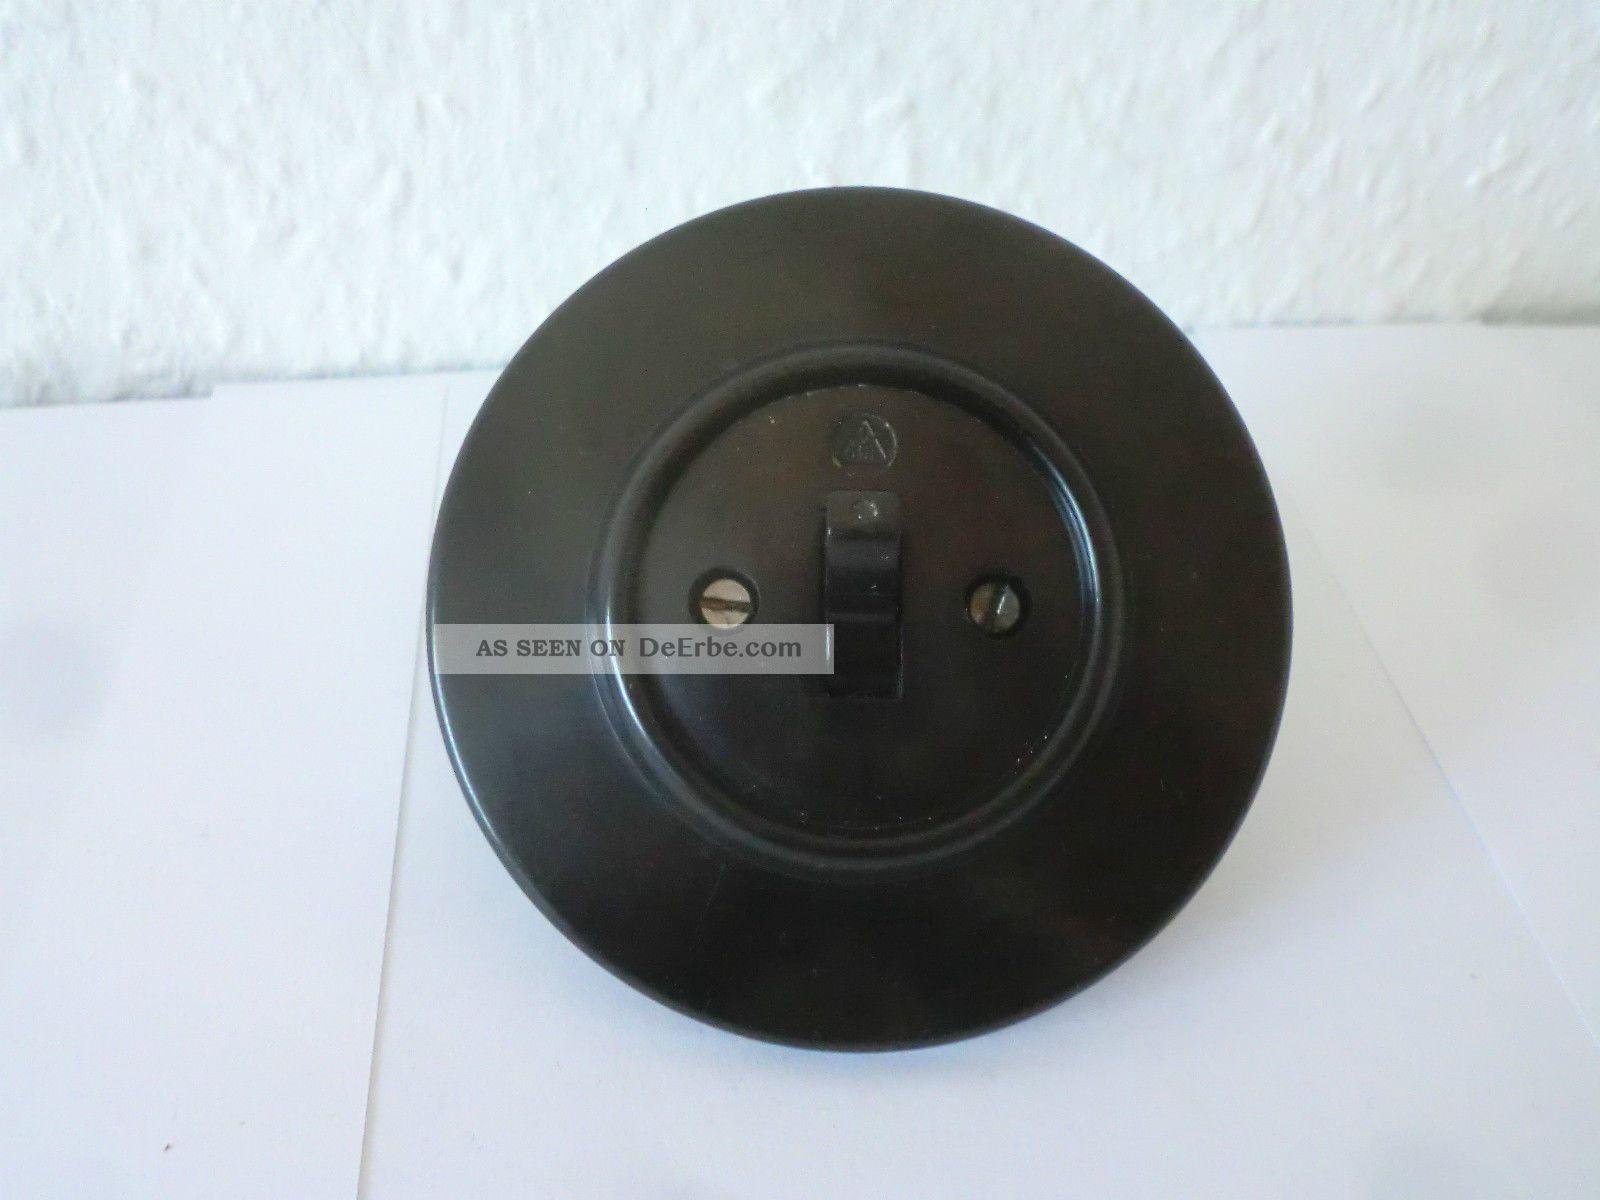 bakelit schalter porzellan unterputz vintage wei antik. Black Bedroom Furniture Sets. Home Design Ideas